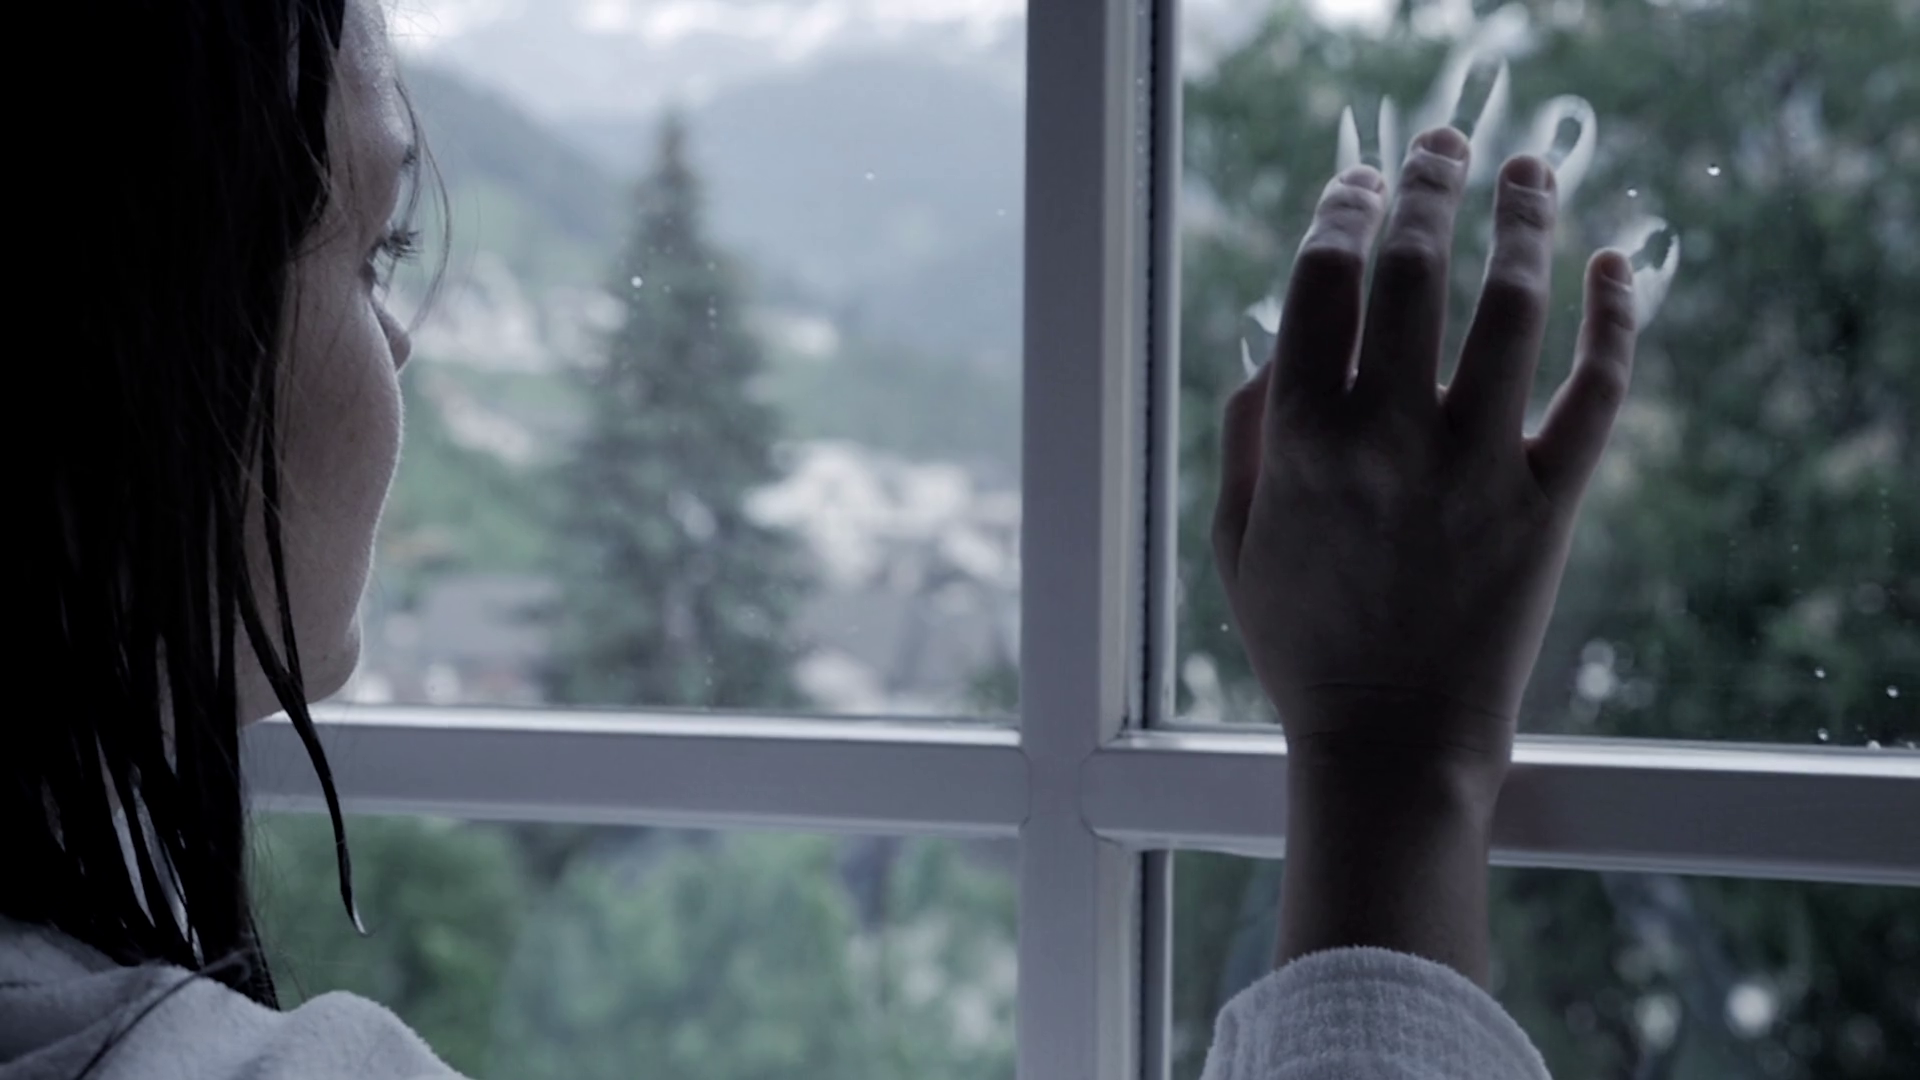 videoblocks-woman-putting-hand-on-window-in-front-of-rain-sad-slow-motion_sduwbzxum_thumbnail-full11